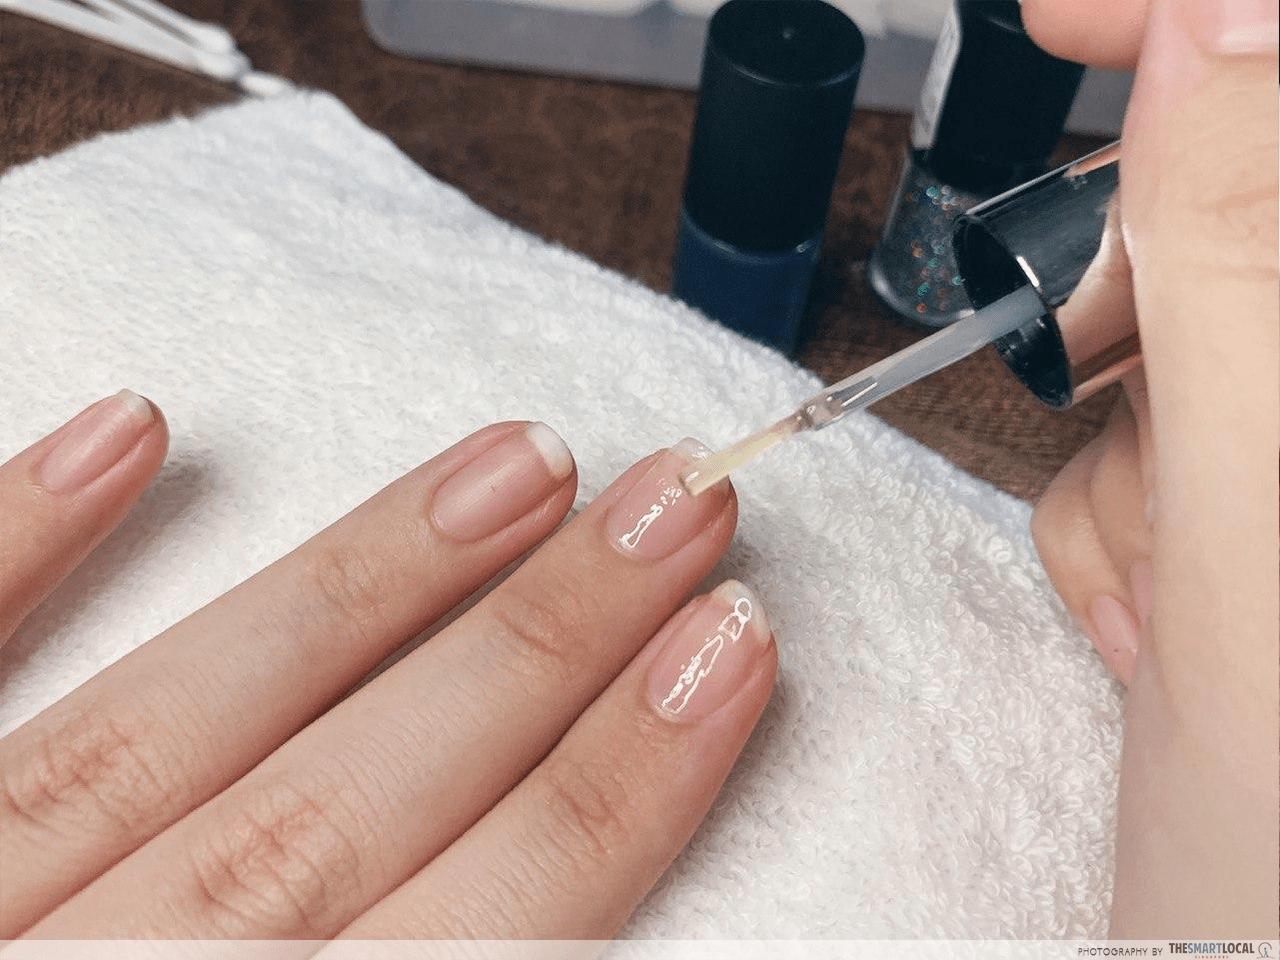 Nails - DIY Manicure